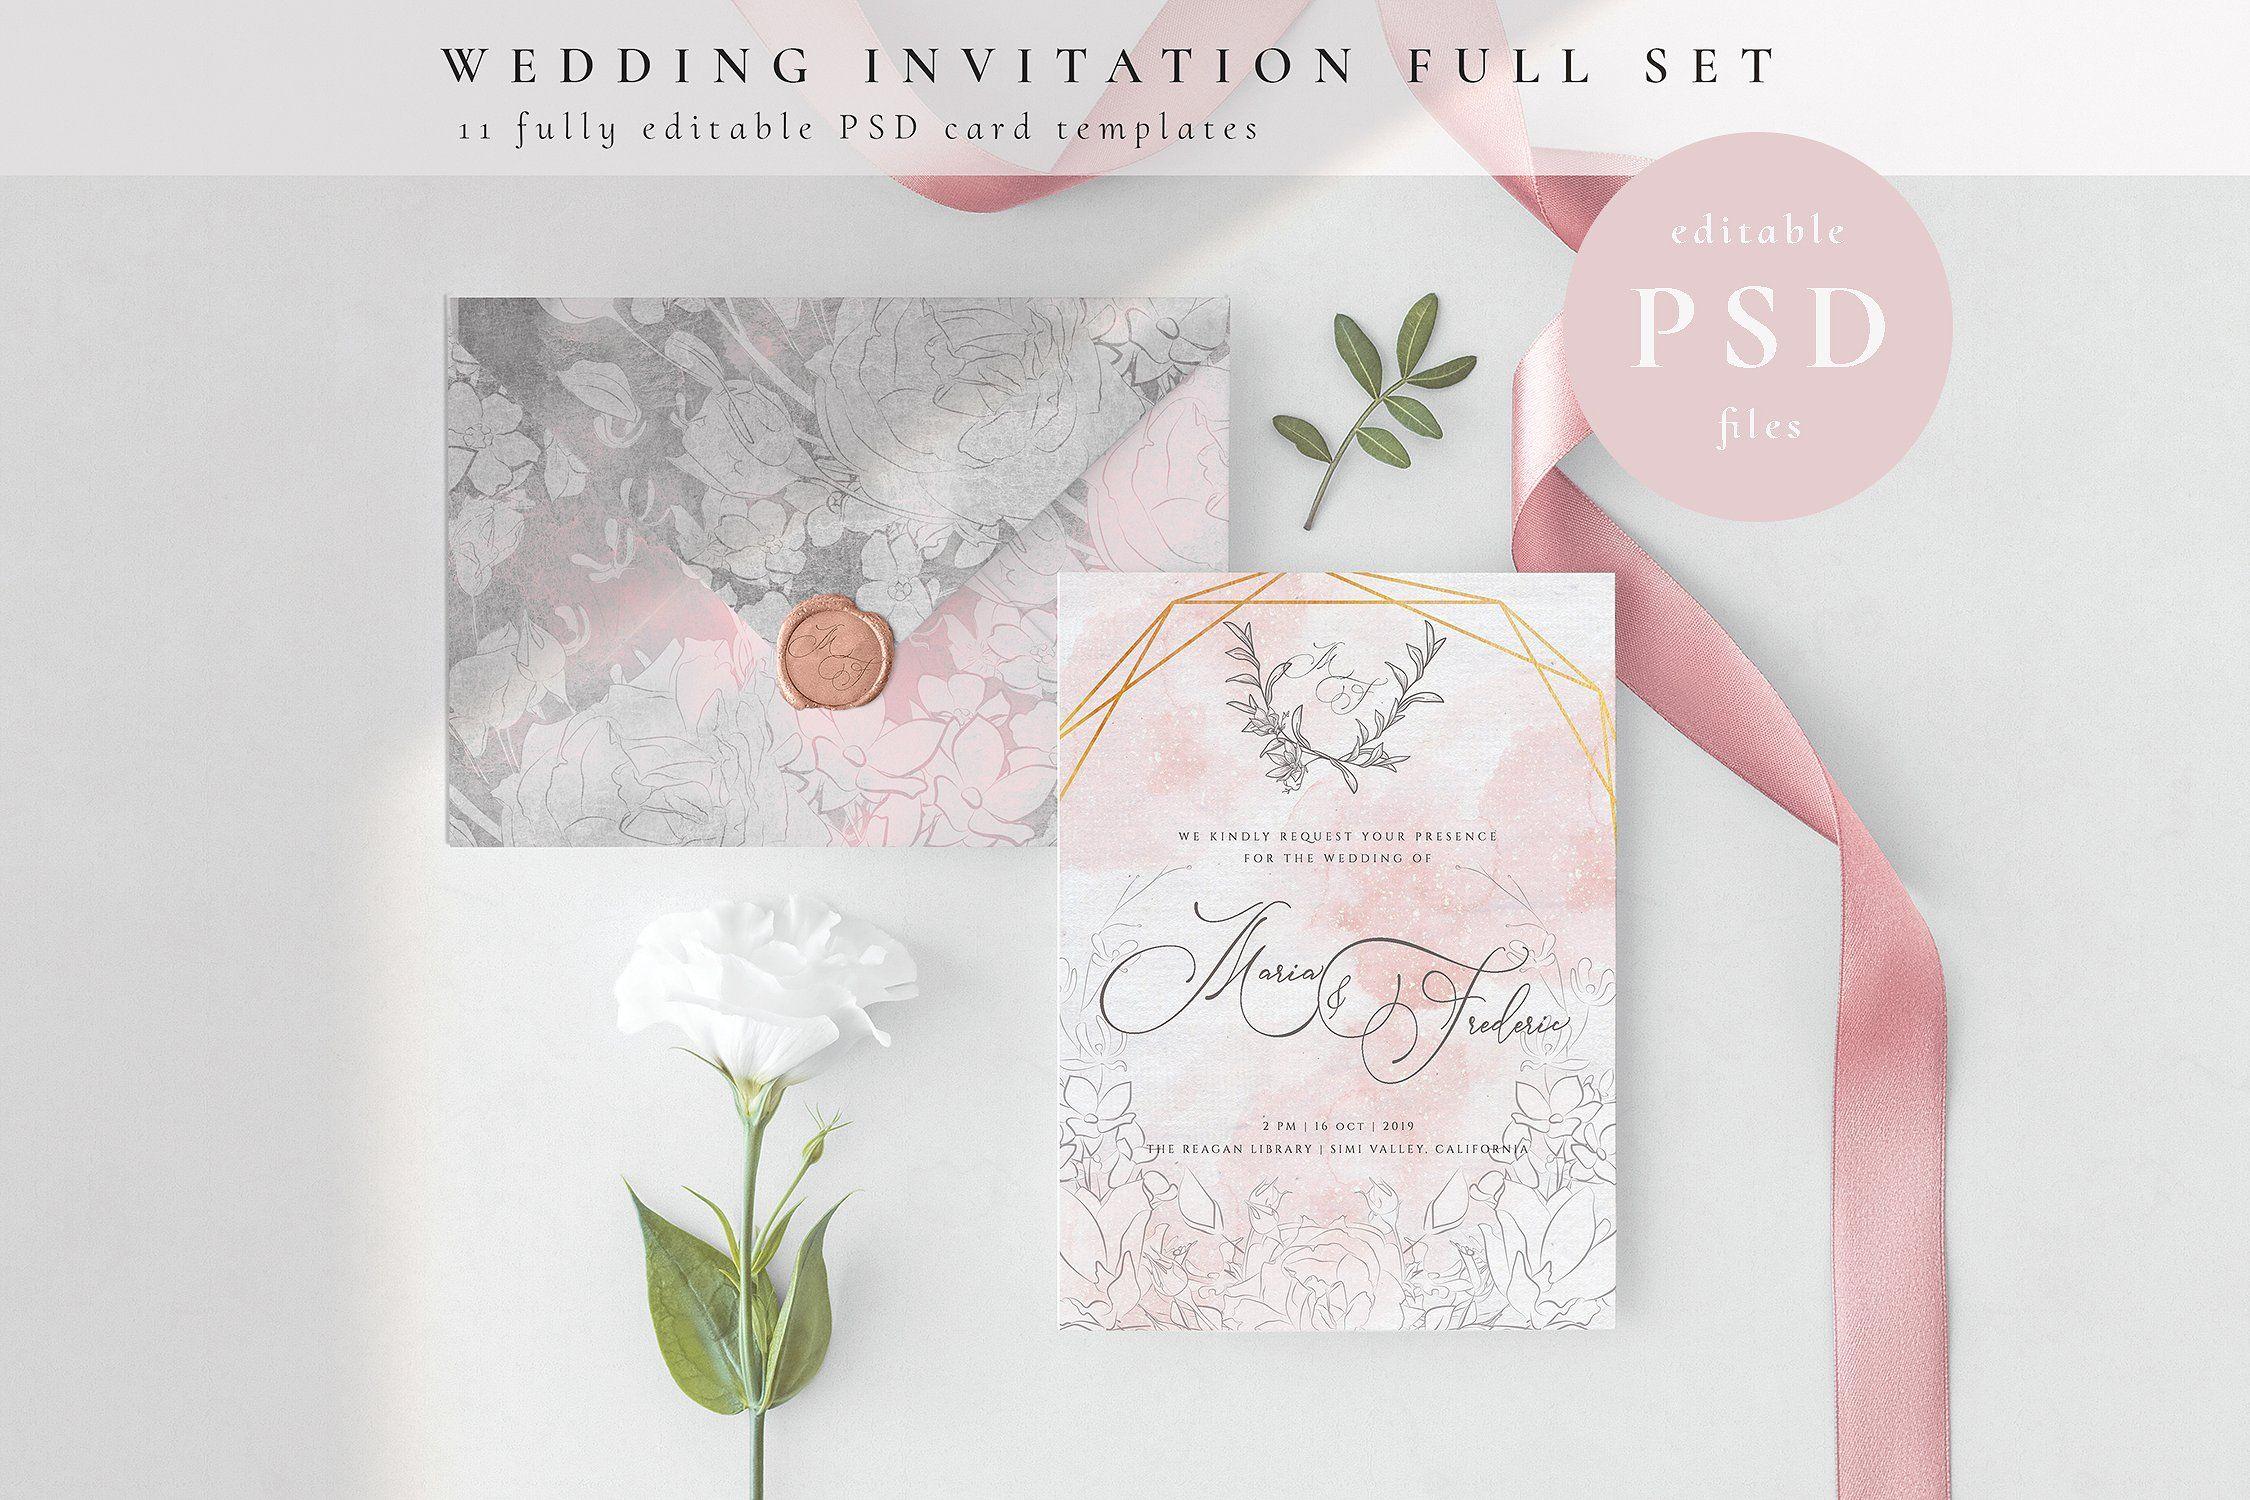 Wedding Invitation Full Set Psd Wedding Invitations Wedding Invitation Cards Wedding Invitation Card Template